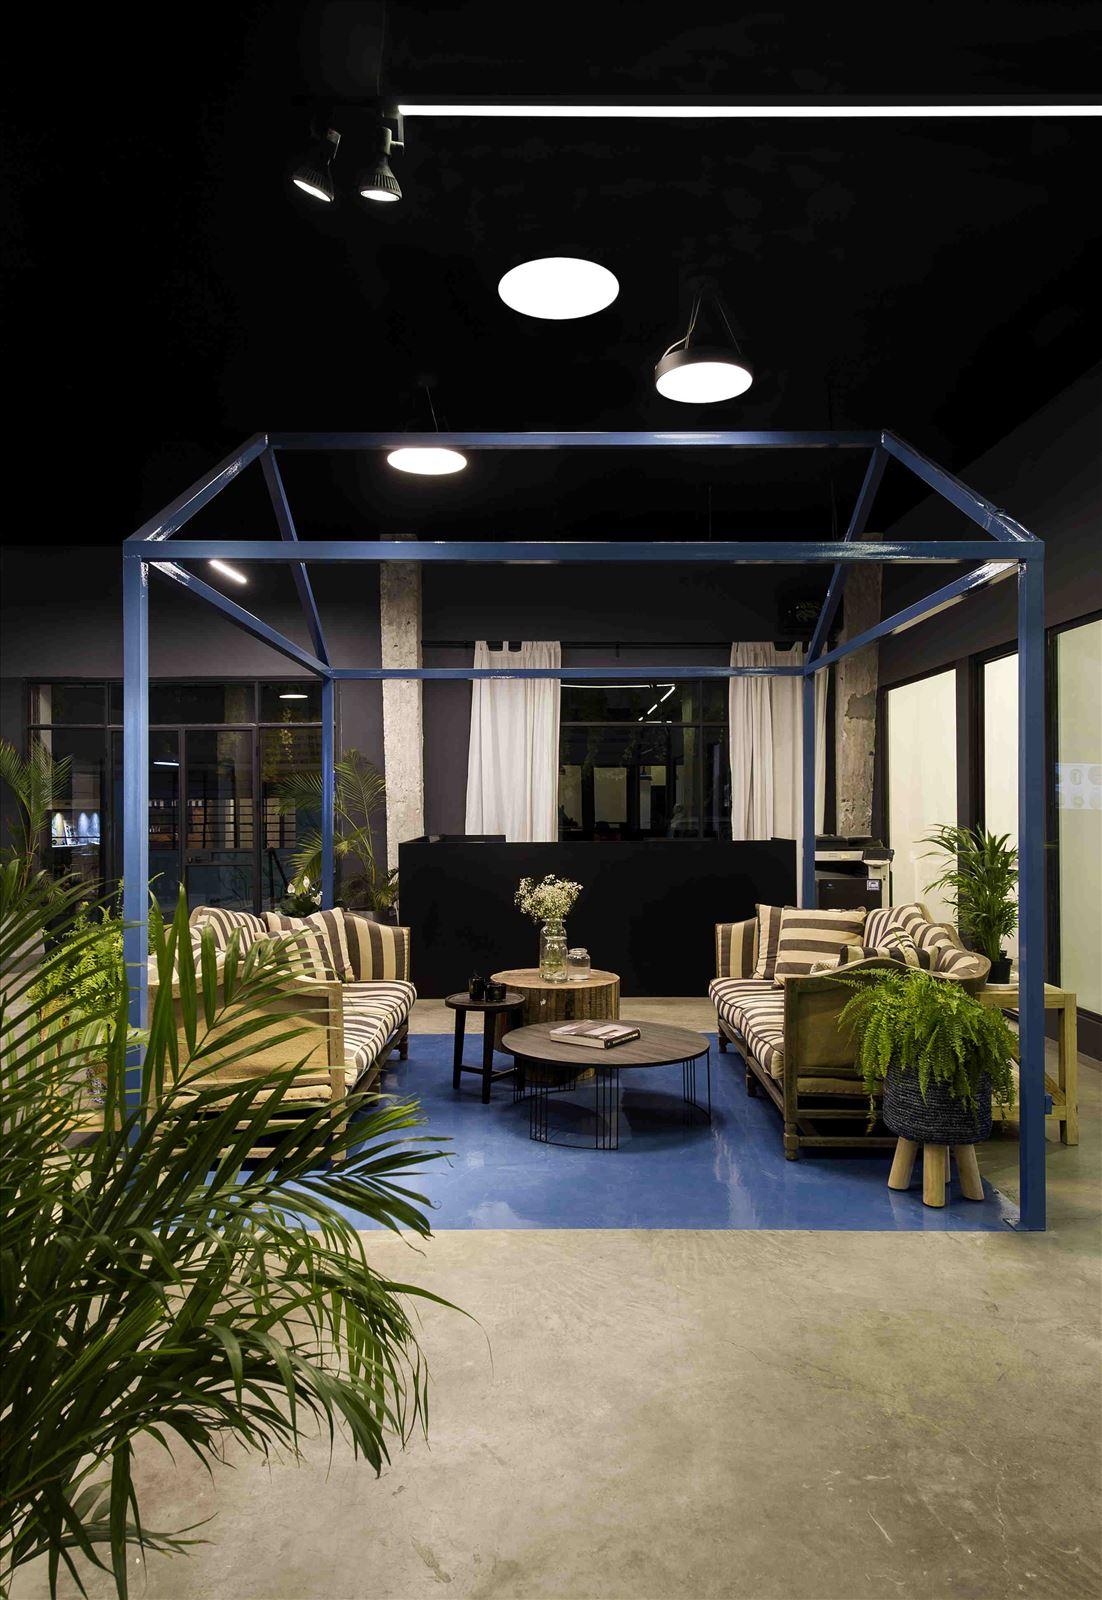 Ewave Offices תאורה בתקרת המשרדים על ידי קמחי תאורה